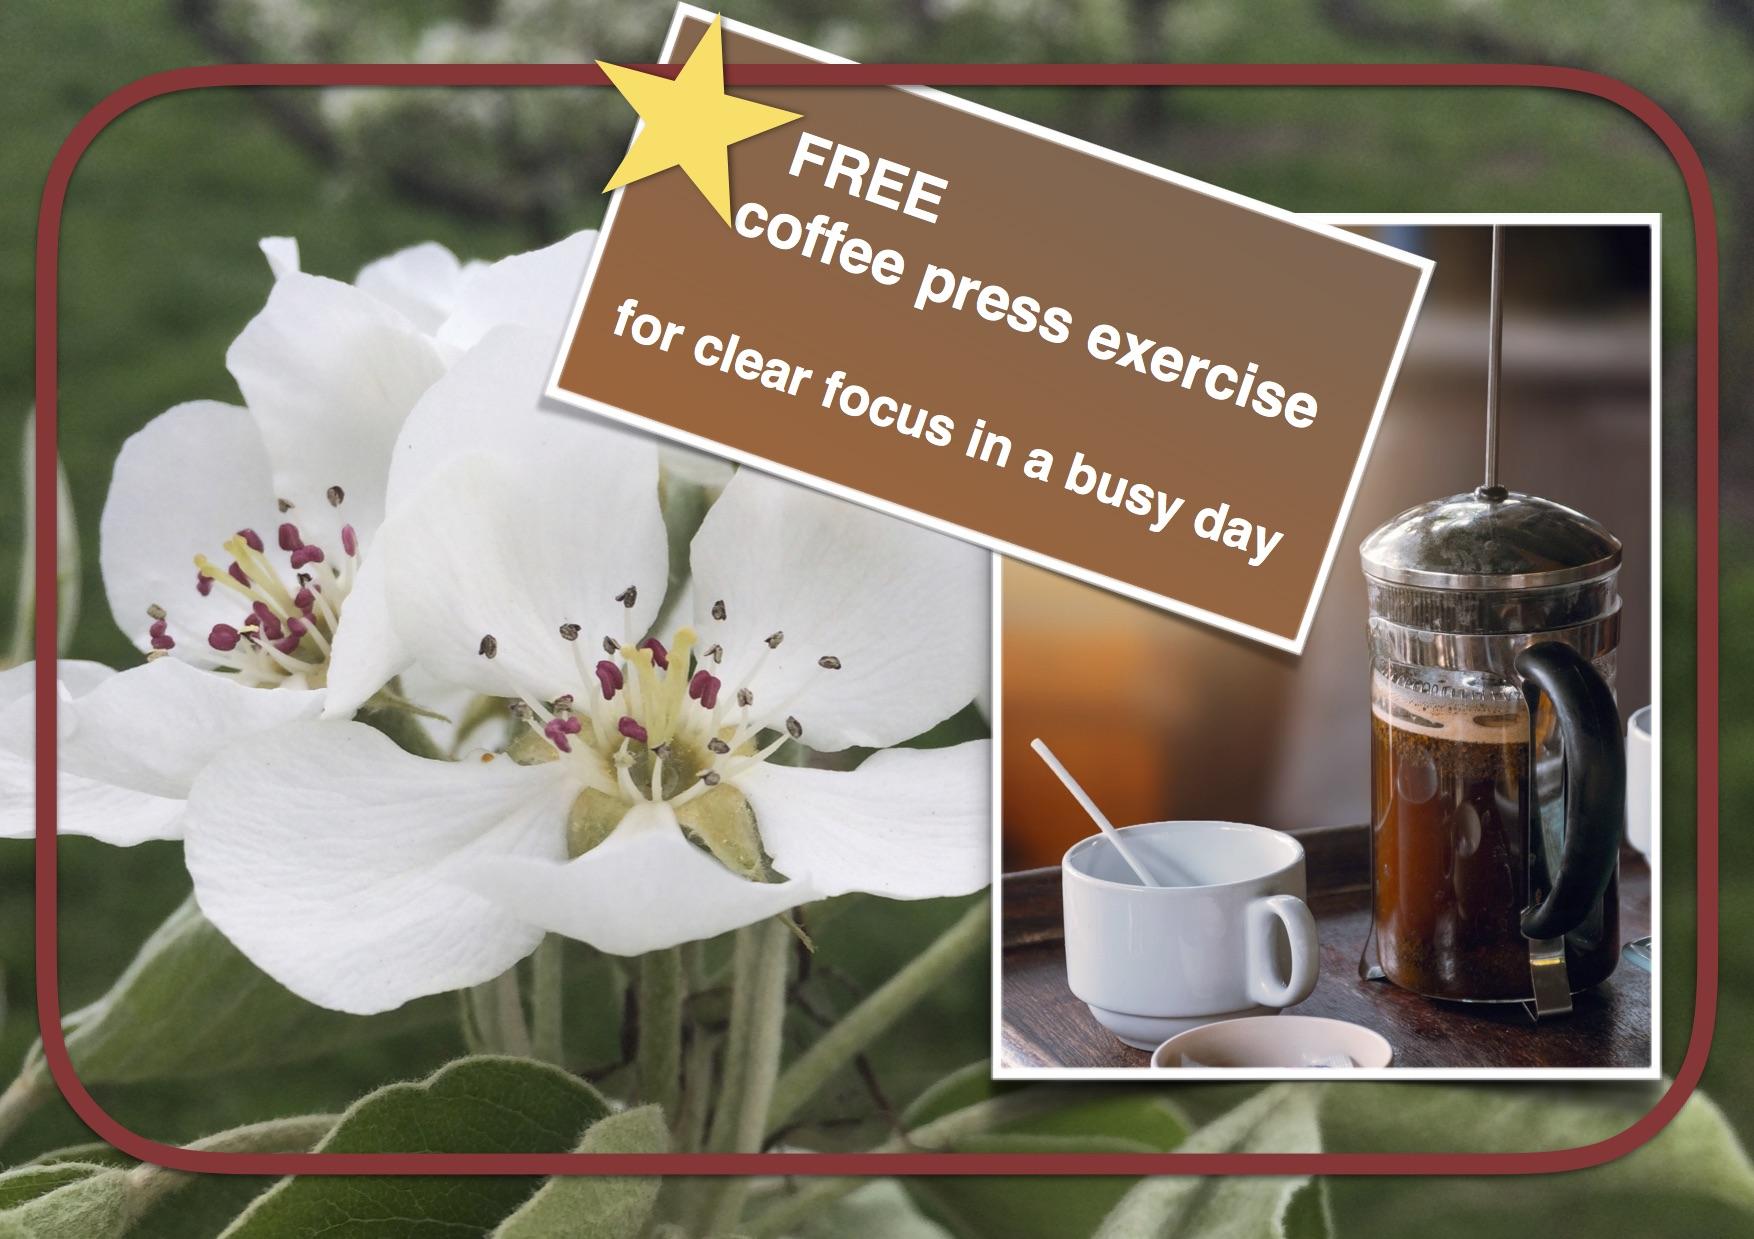 Receive Coffee Press exercise